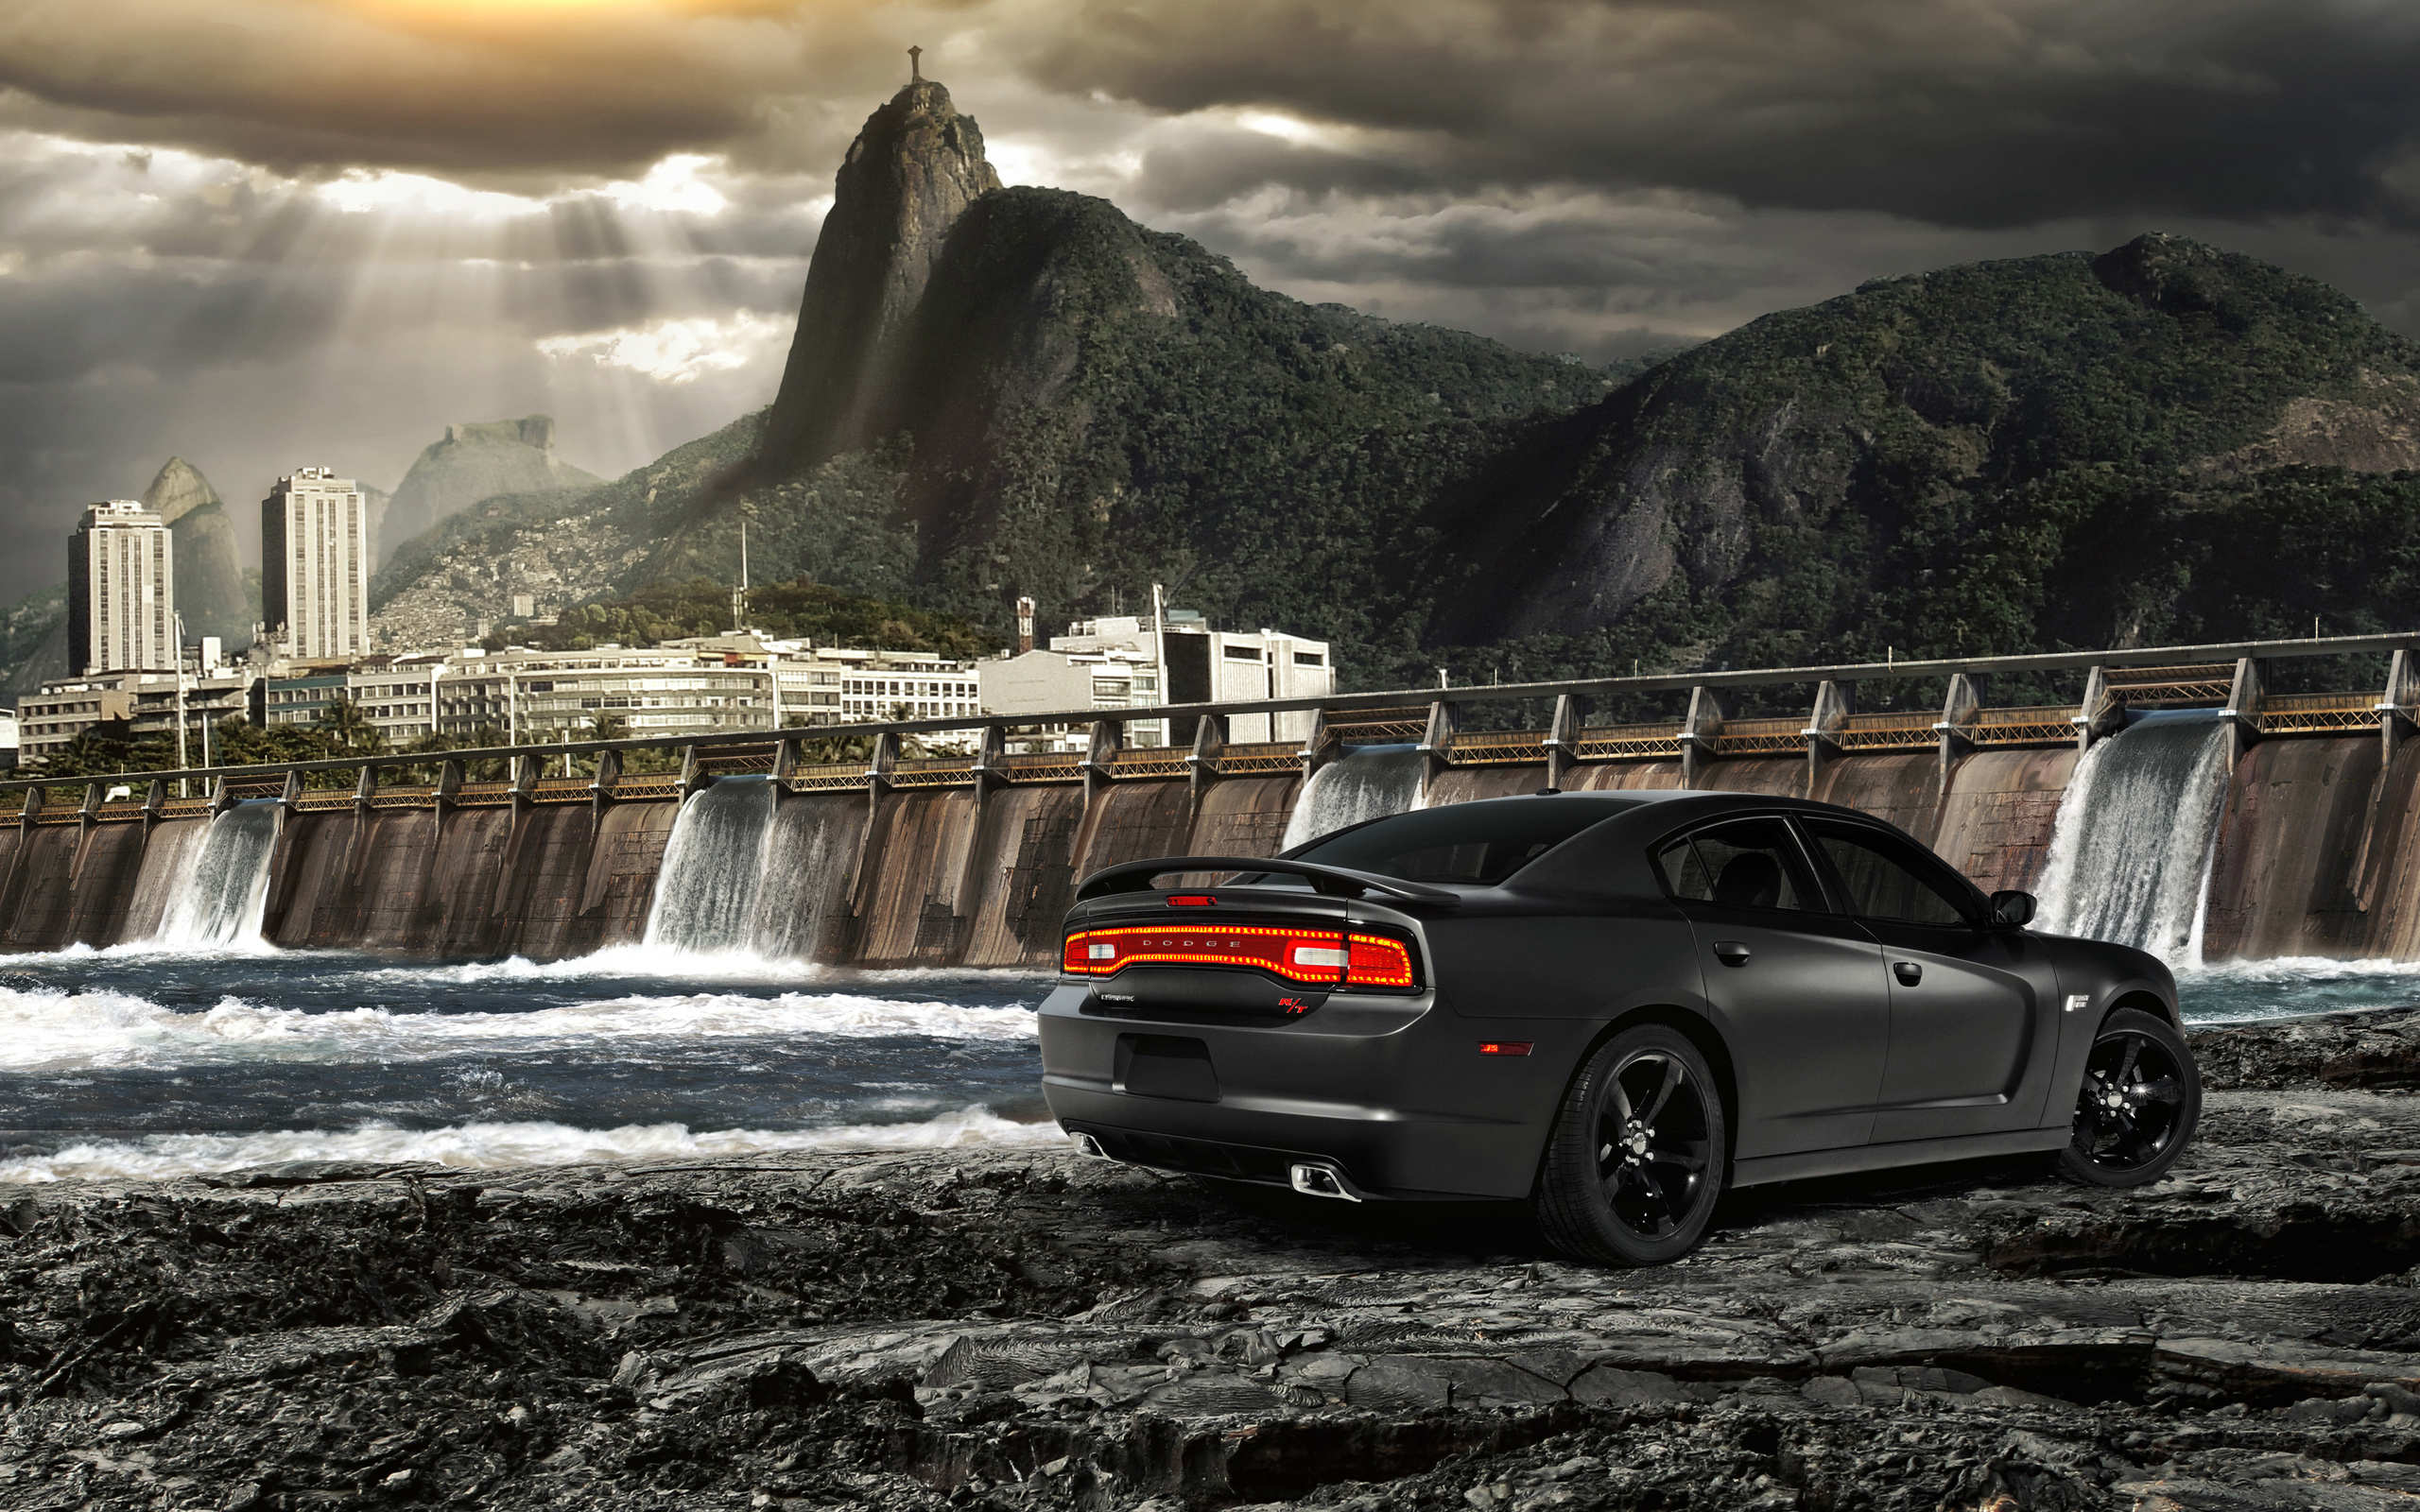 2560x1600px Black Dodge Charger Wallpaper Wallpapersafari